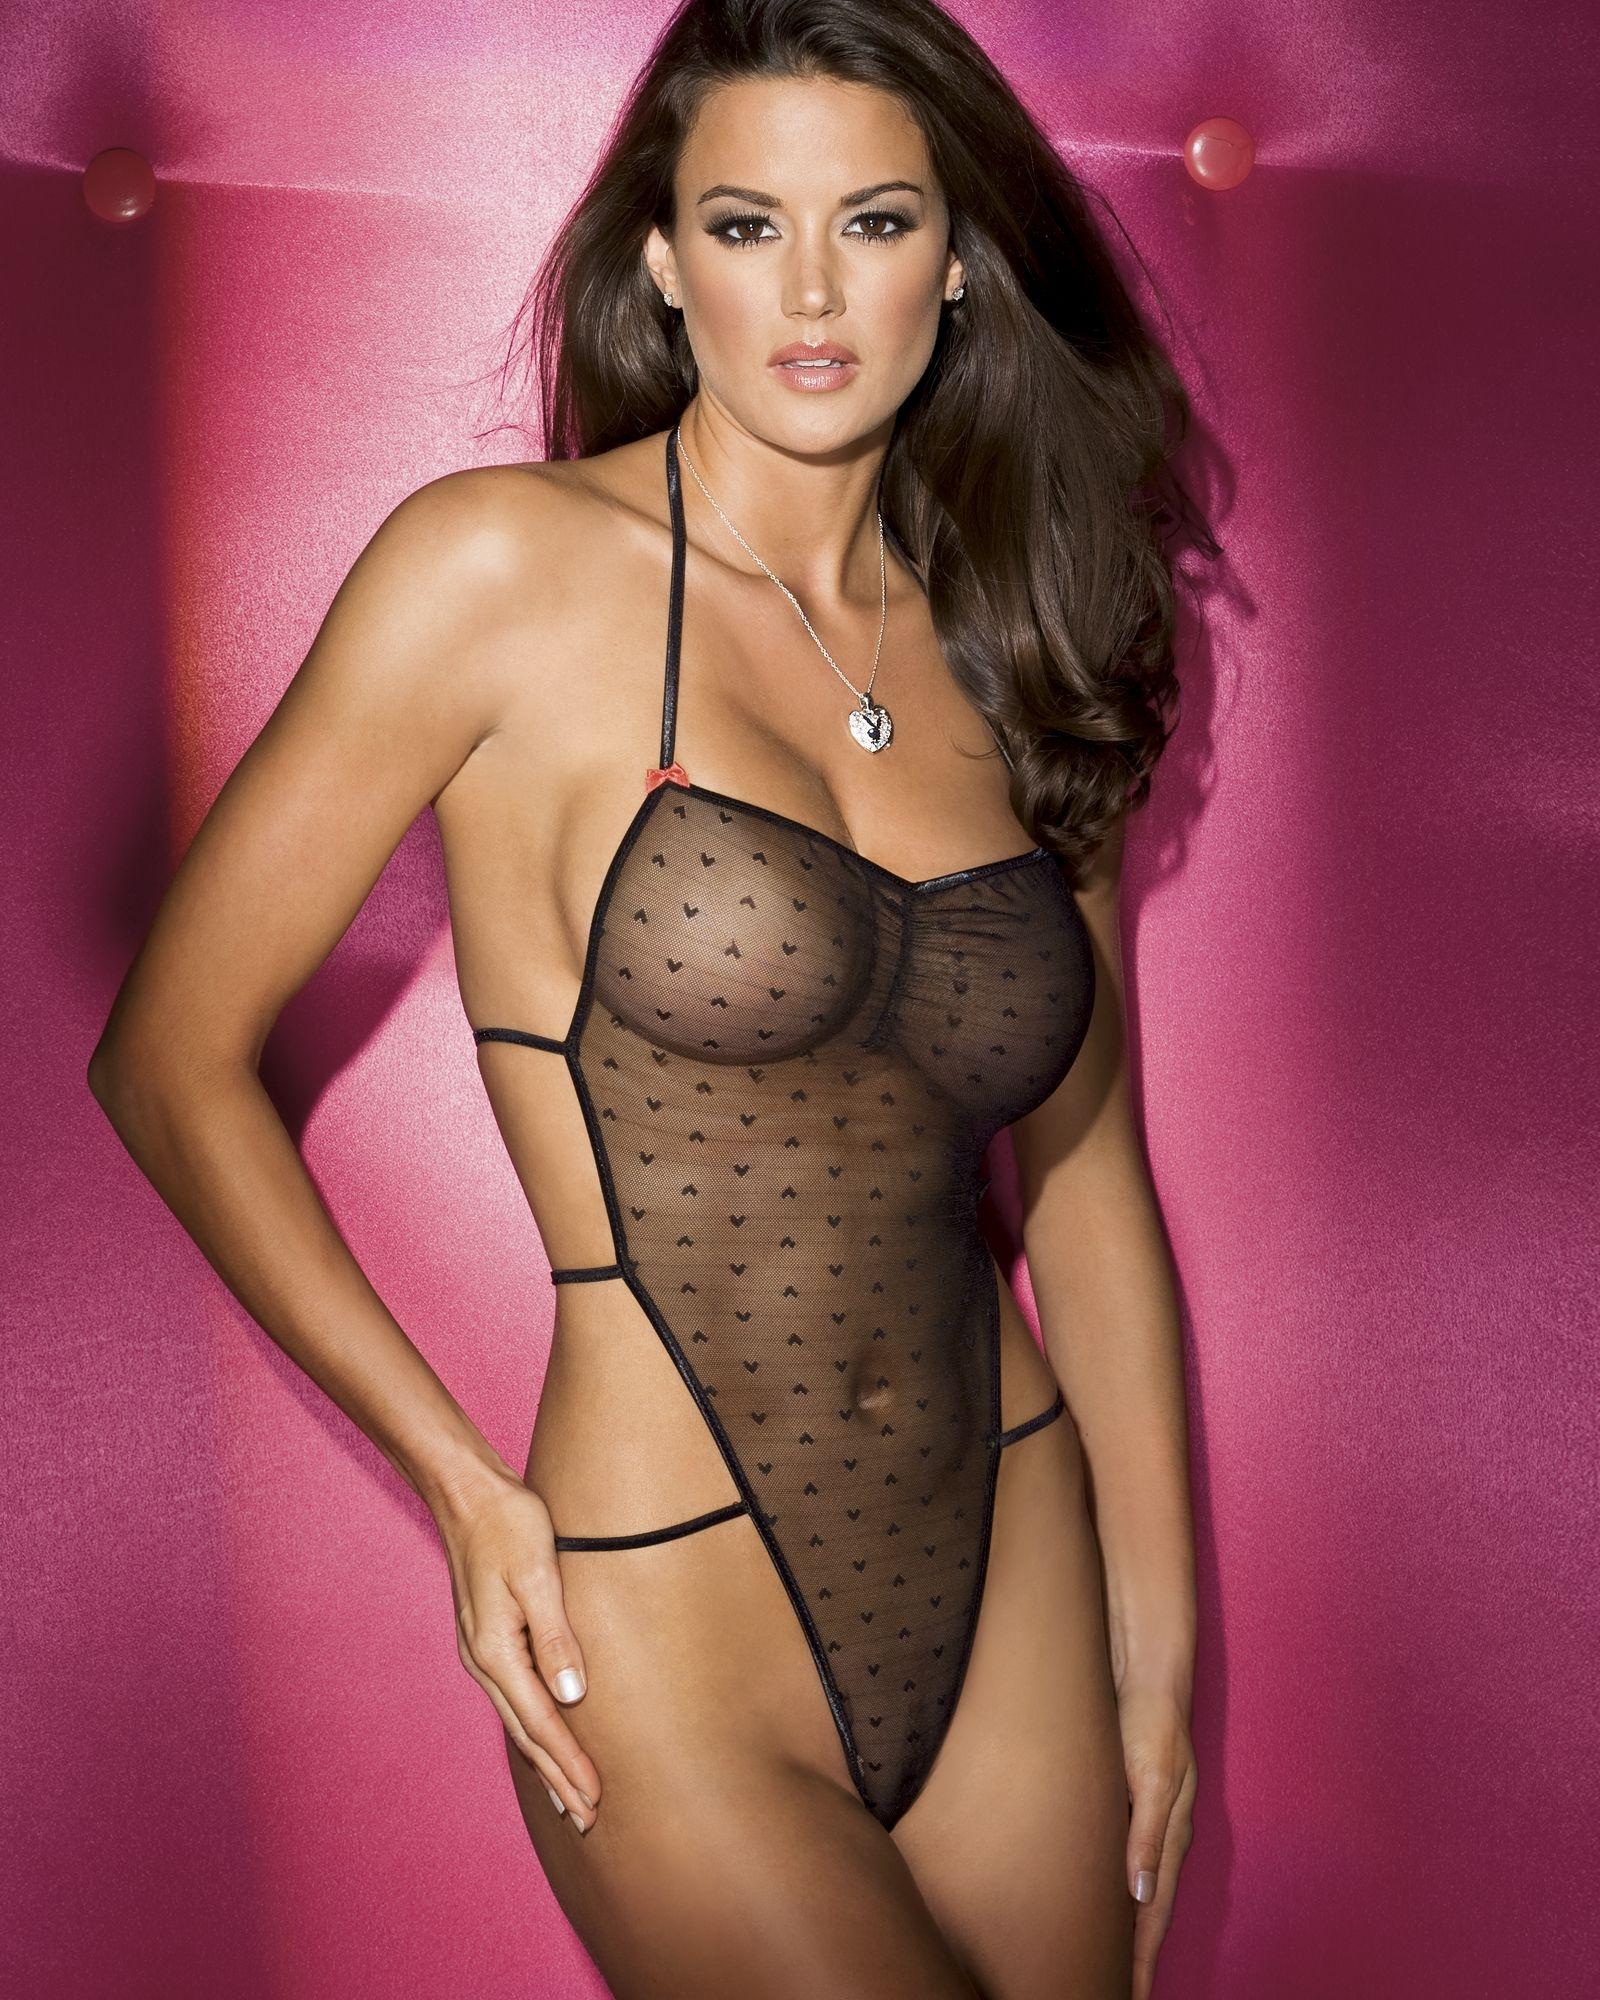 What bra do victoria's secret models wear